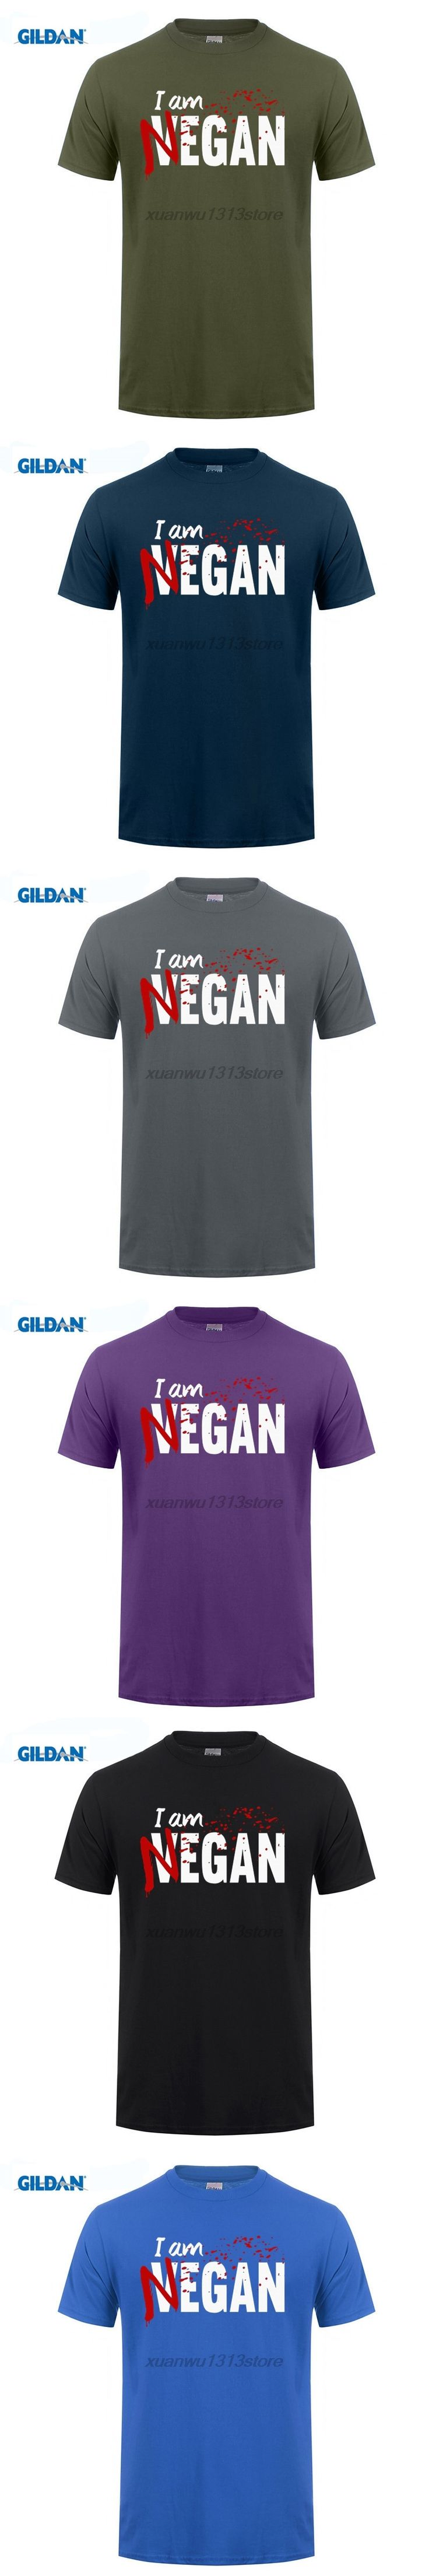 GILDAN I'm Negan T Shirt Male Arrival Simple Camiseta Loose The Walking Dead T-Shirts Negan Short Sleeve O Neck Teenboy Clothes